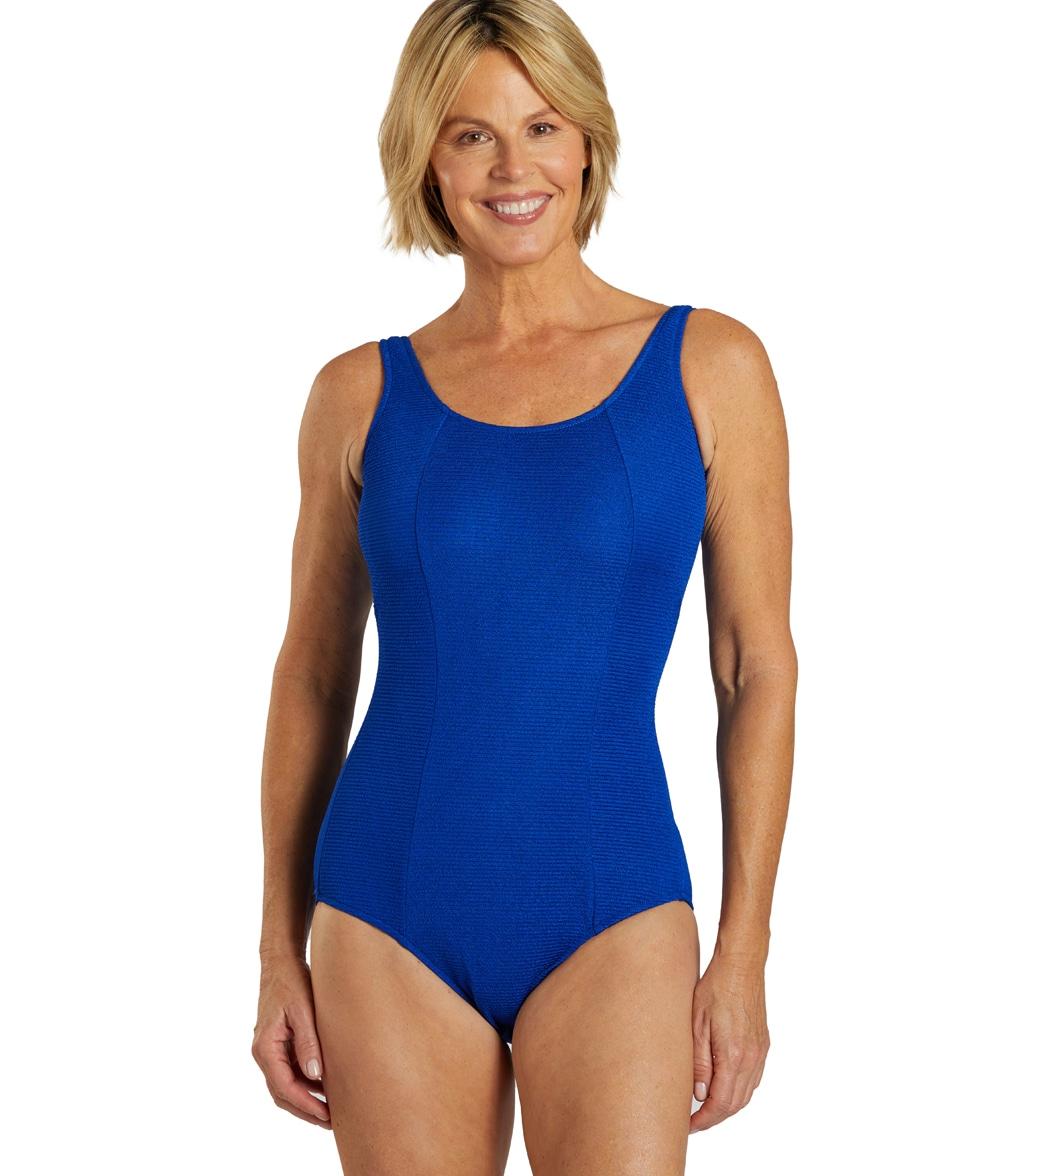 New John Lewis Girls Mermaid Splash Swimsuit Royal Blue RRP £14